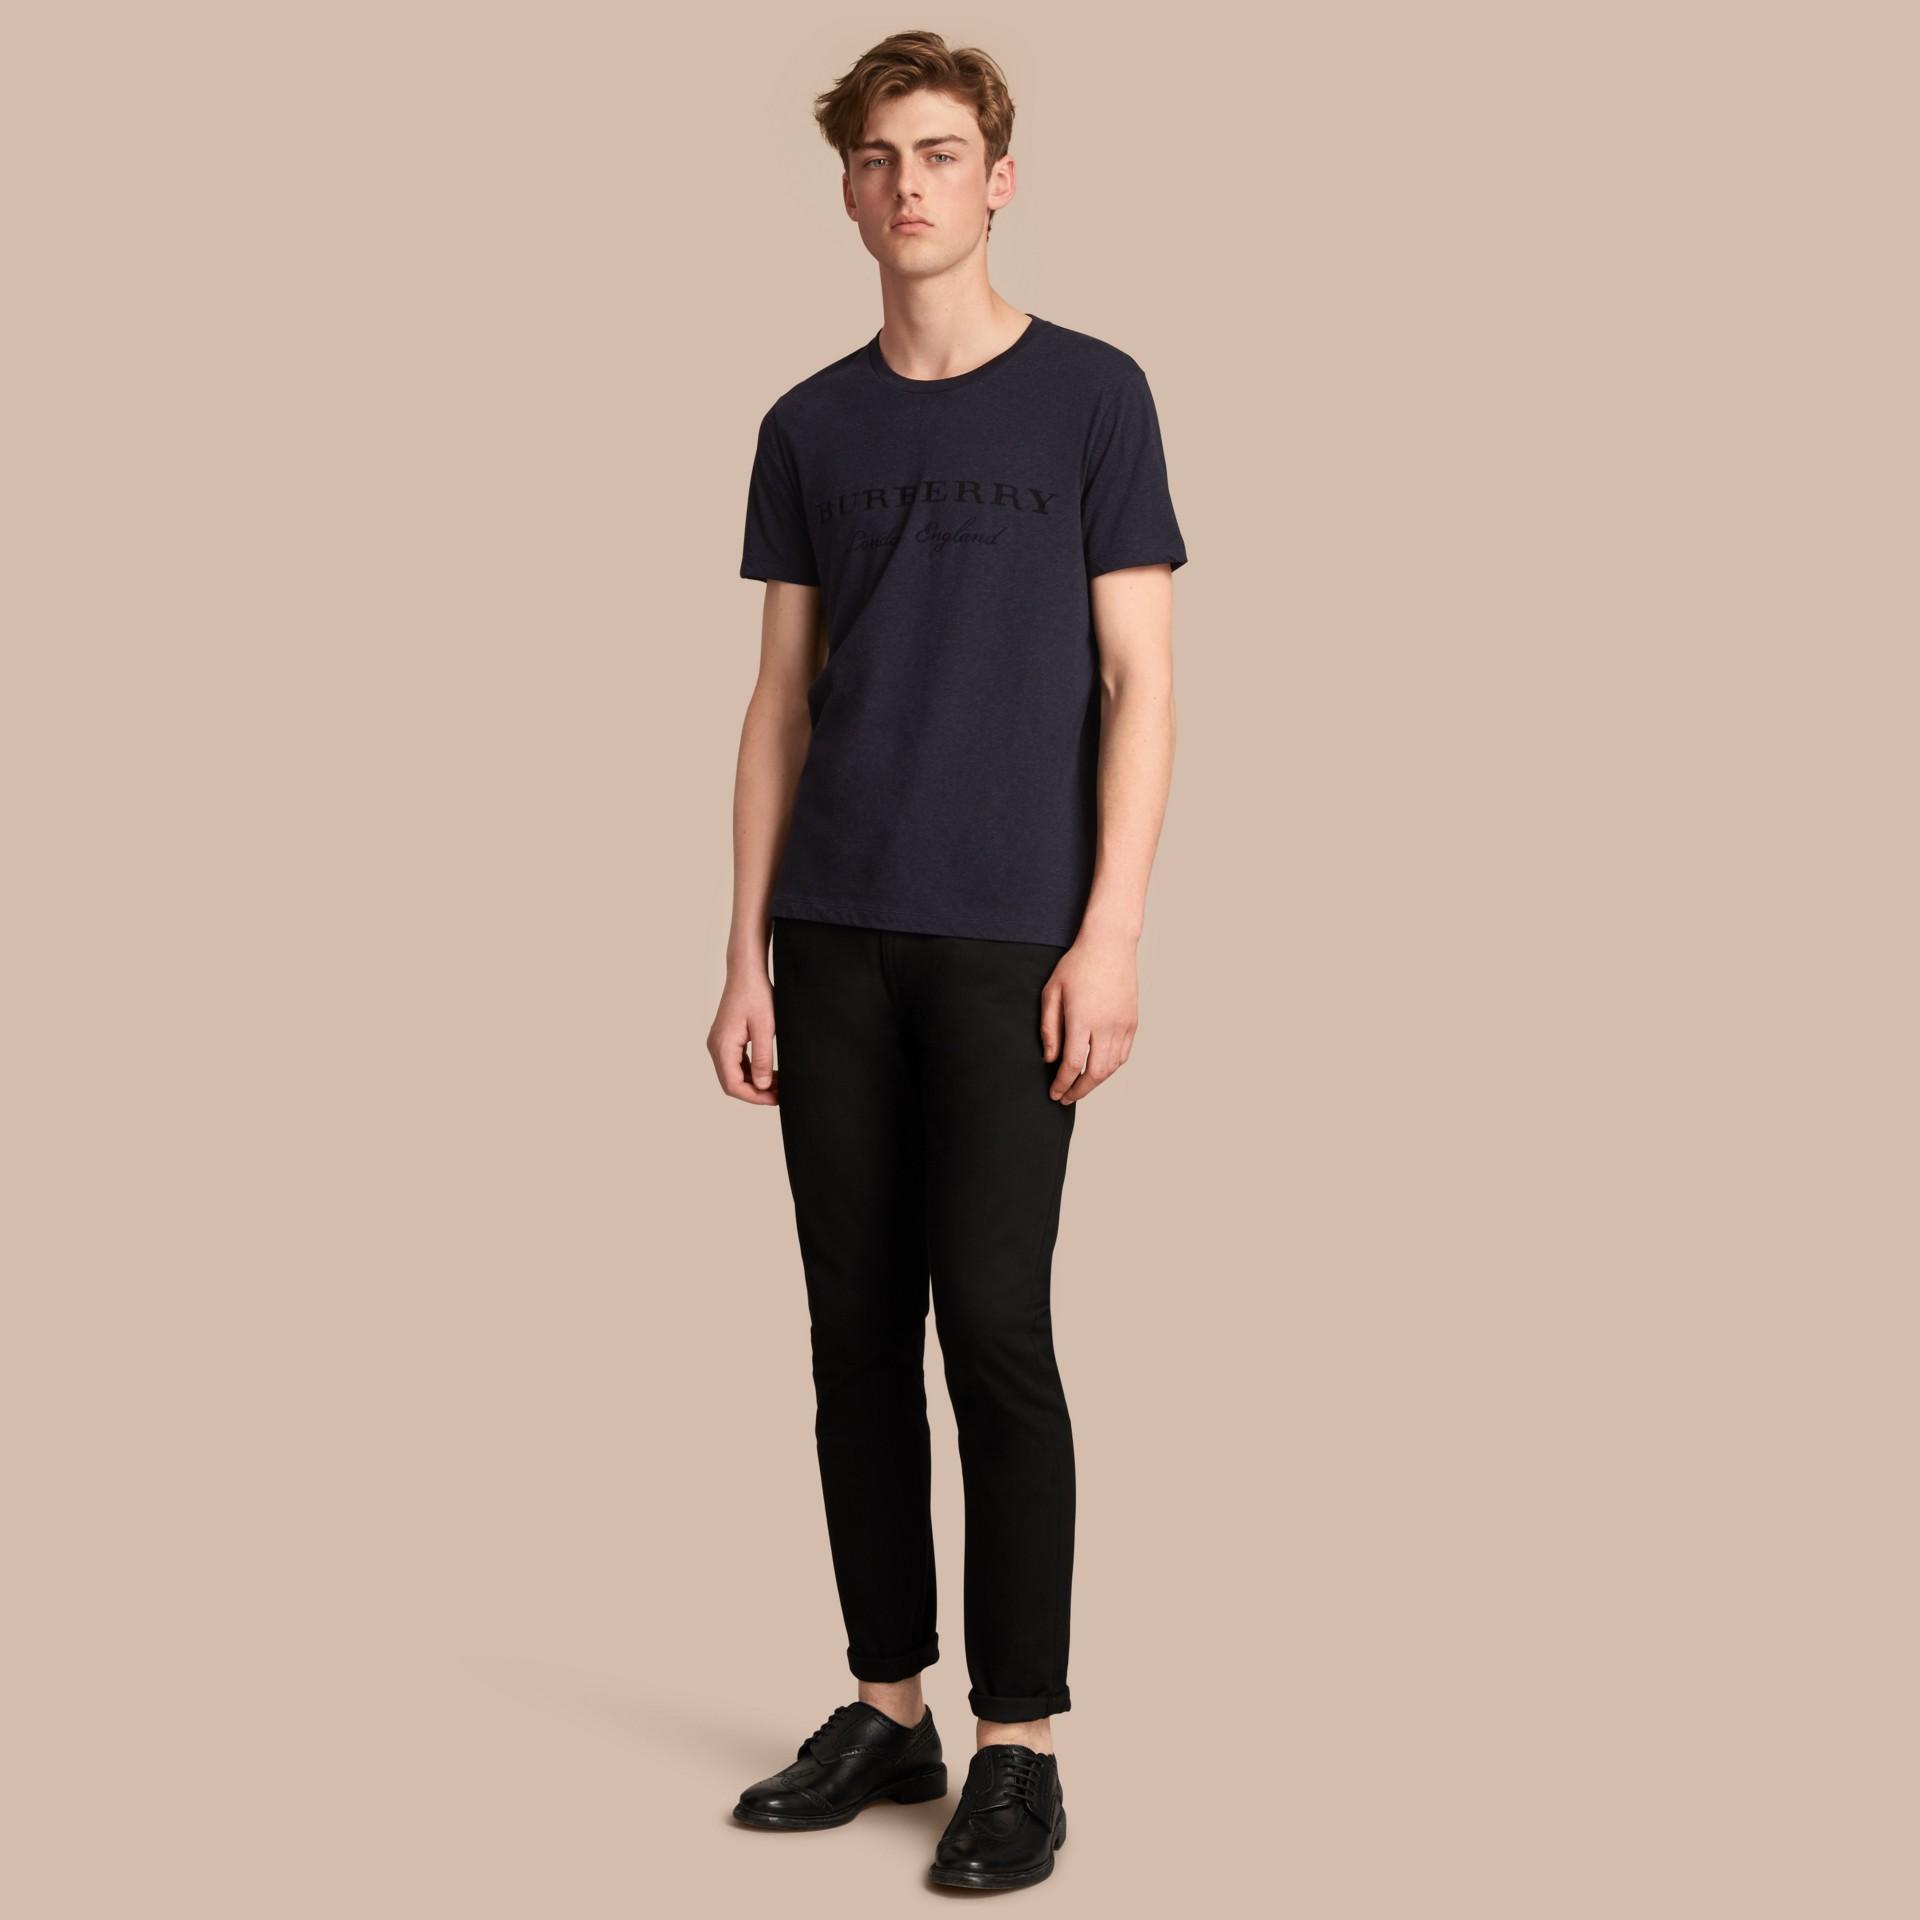 Devoré Cotton Jersey T-shirt in Navy Melange - gallery image 1